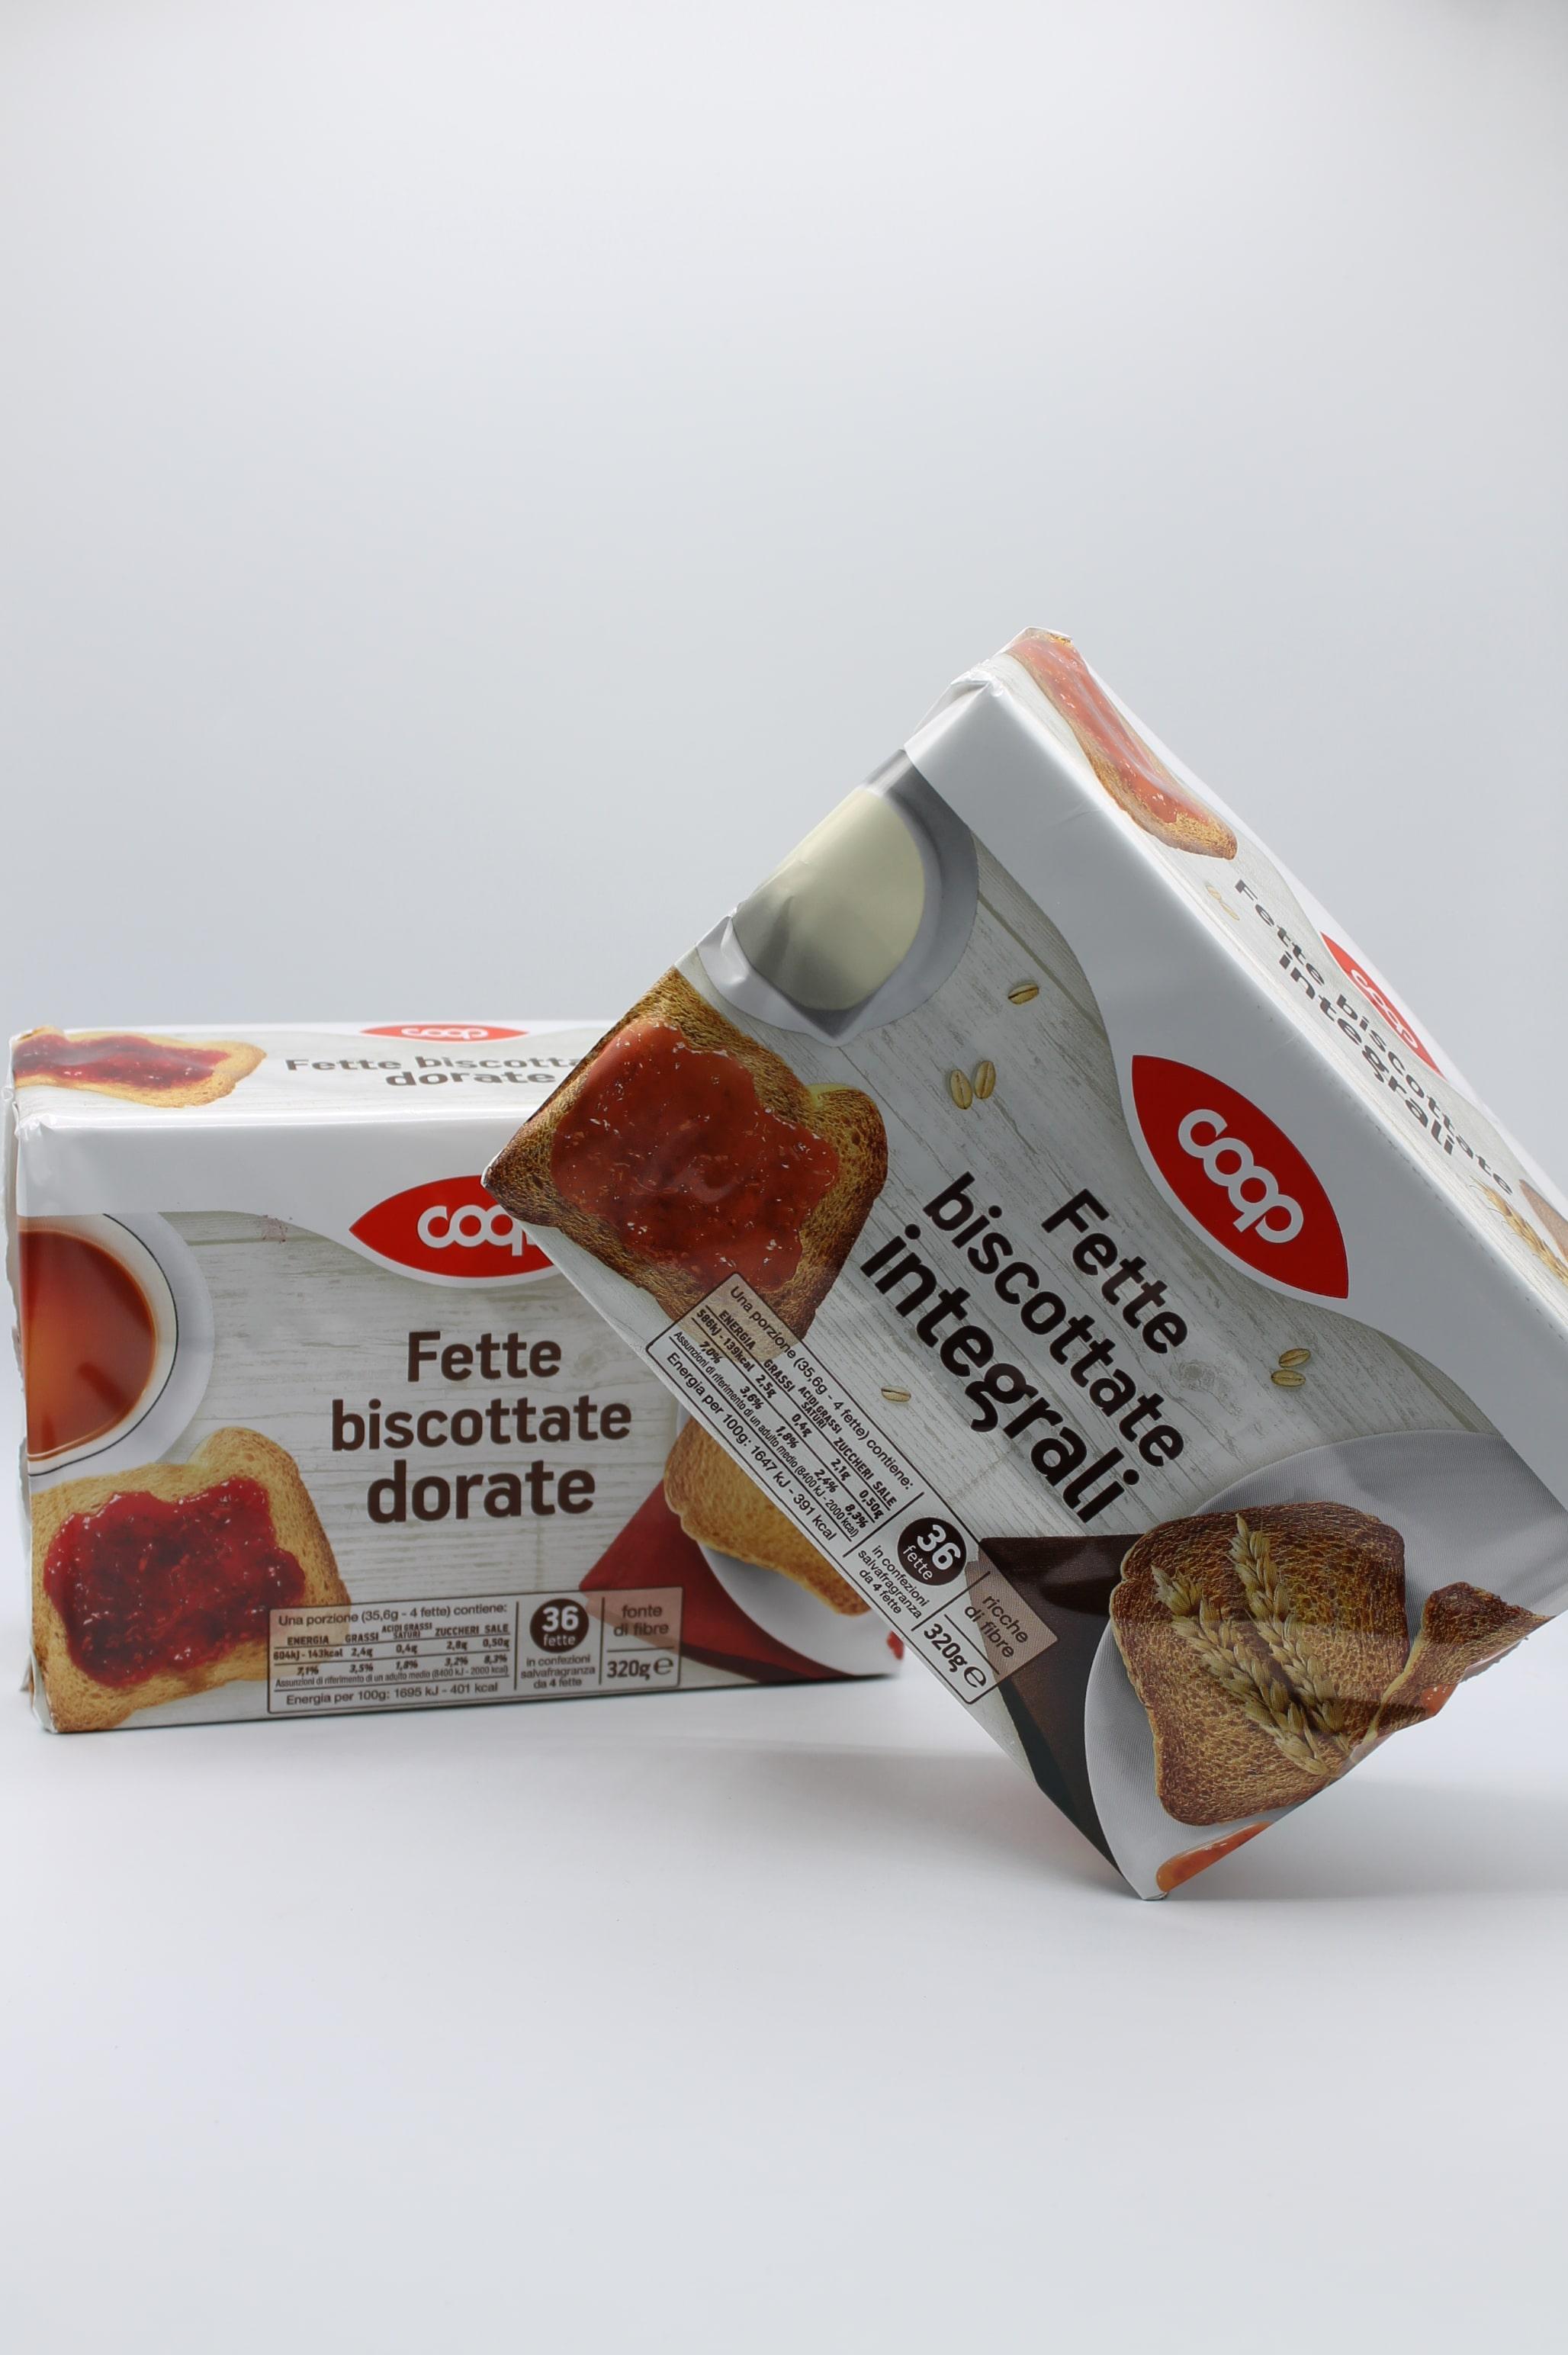 Coop fette biscottate assortite 320 gr.